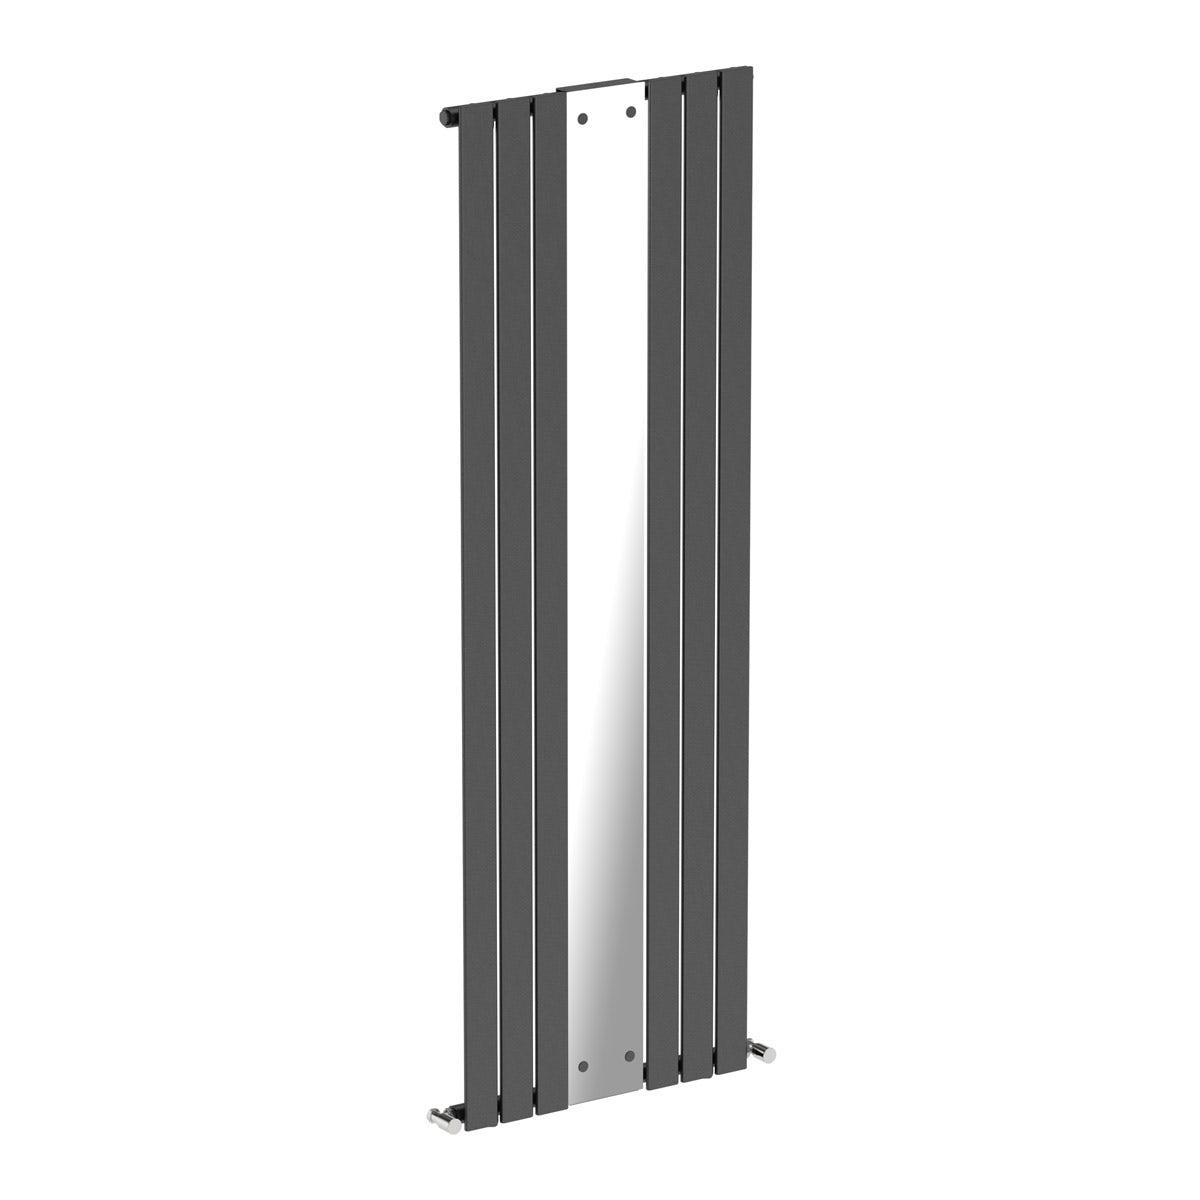 Mode Ellis anthracite vertical radiator with mirror 1840 x 620